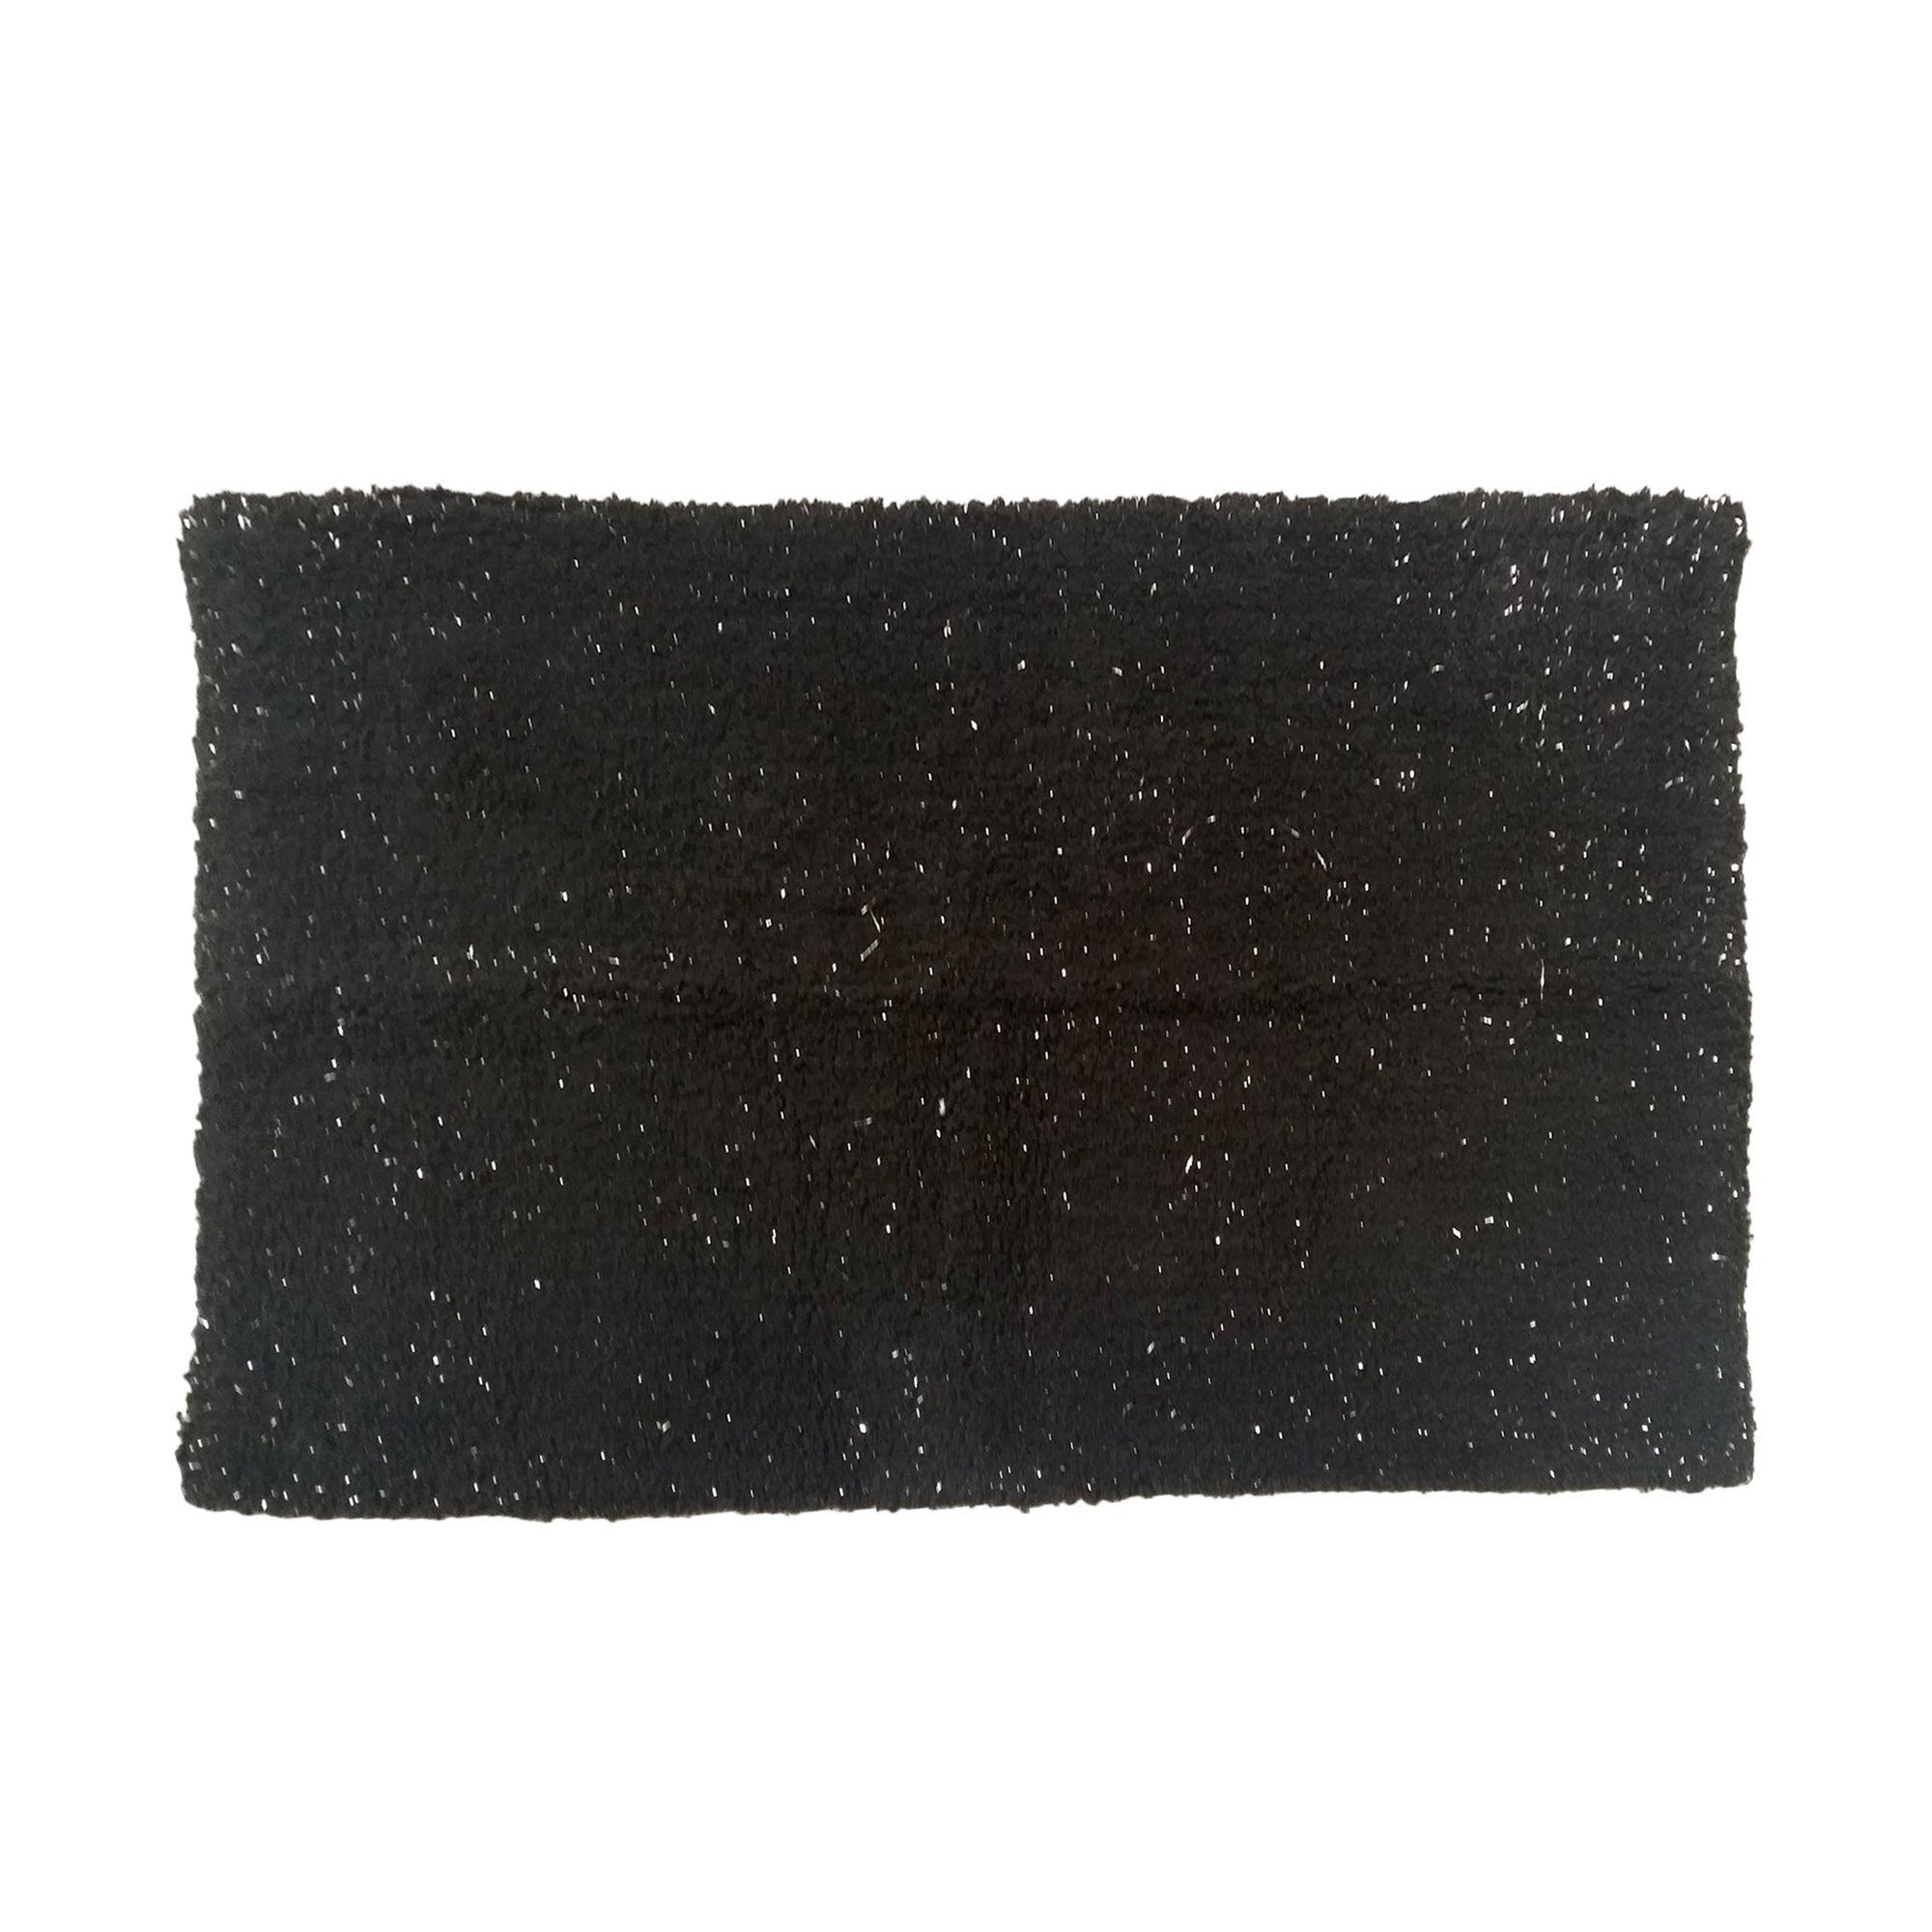 Photo of Black and silver bath mat black